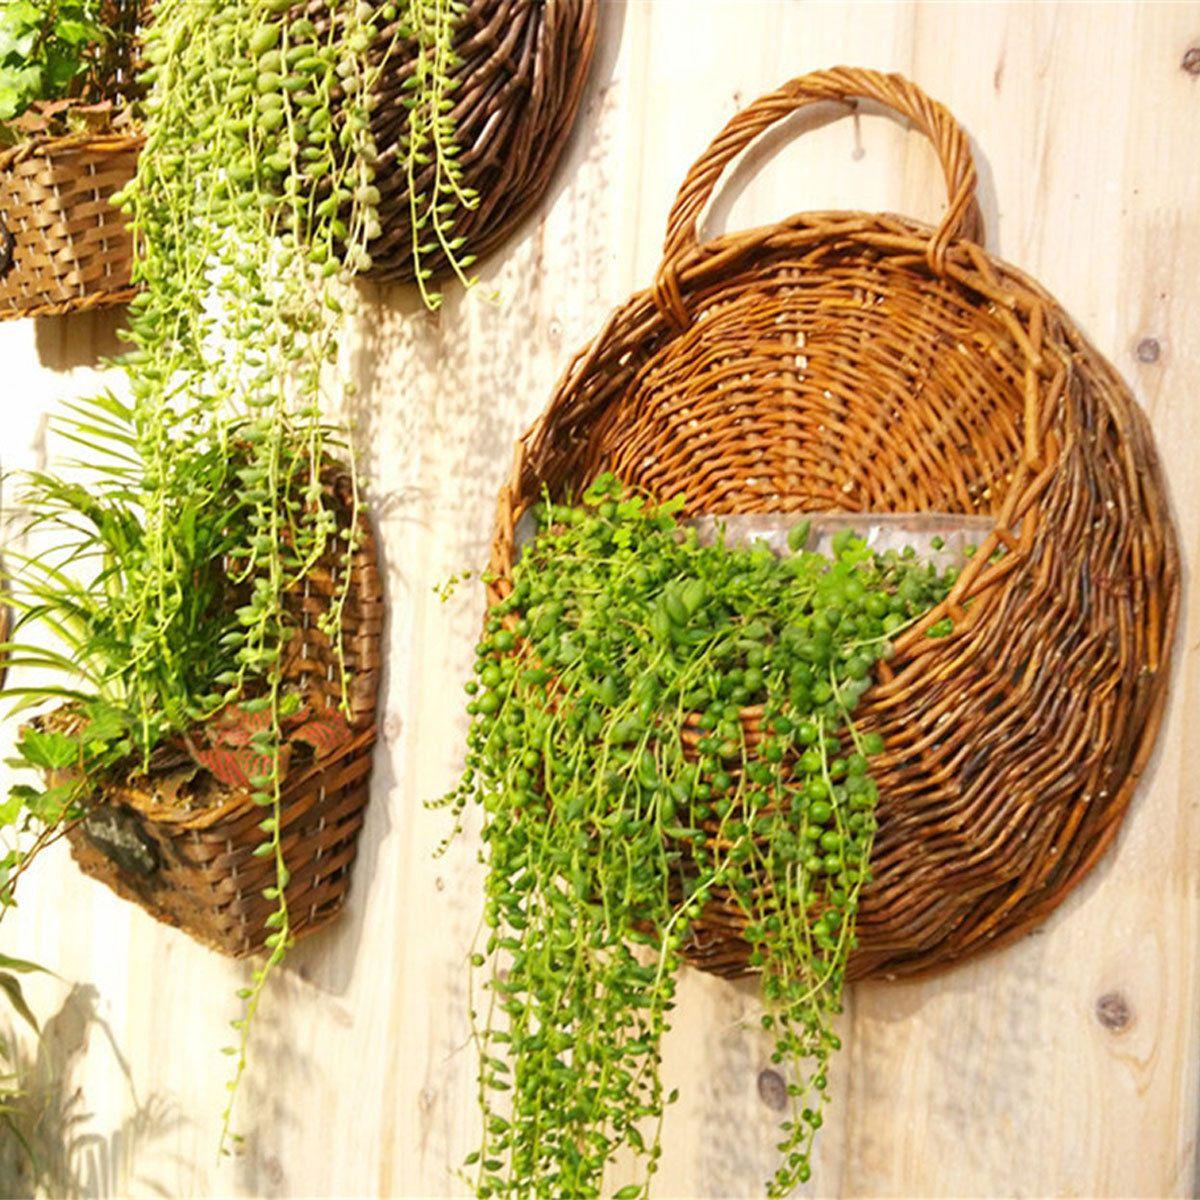 Handmade Woven Flower Planter Plant Wall Hanging Basket Garden Holder Home Decor Hanging Basket Garden Hanging Flower Pots Hanging Plants